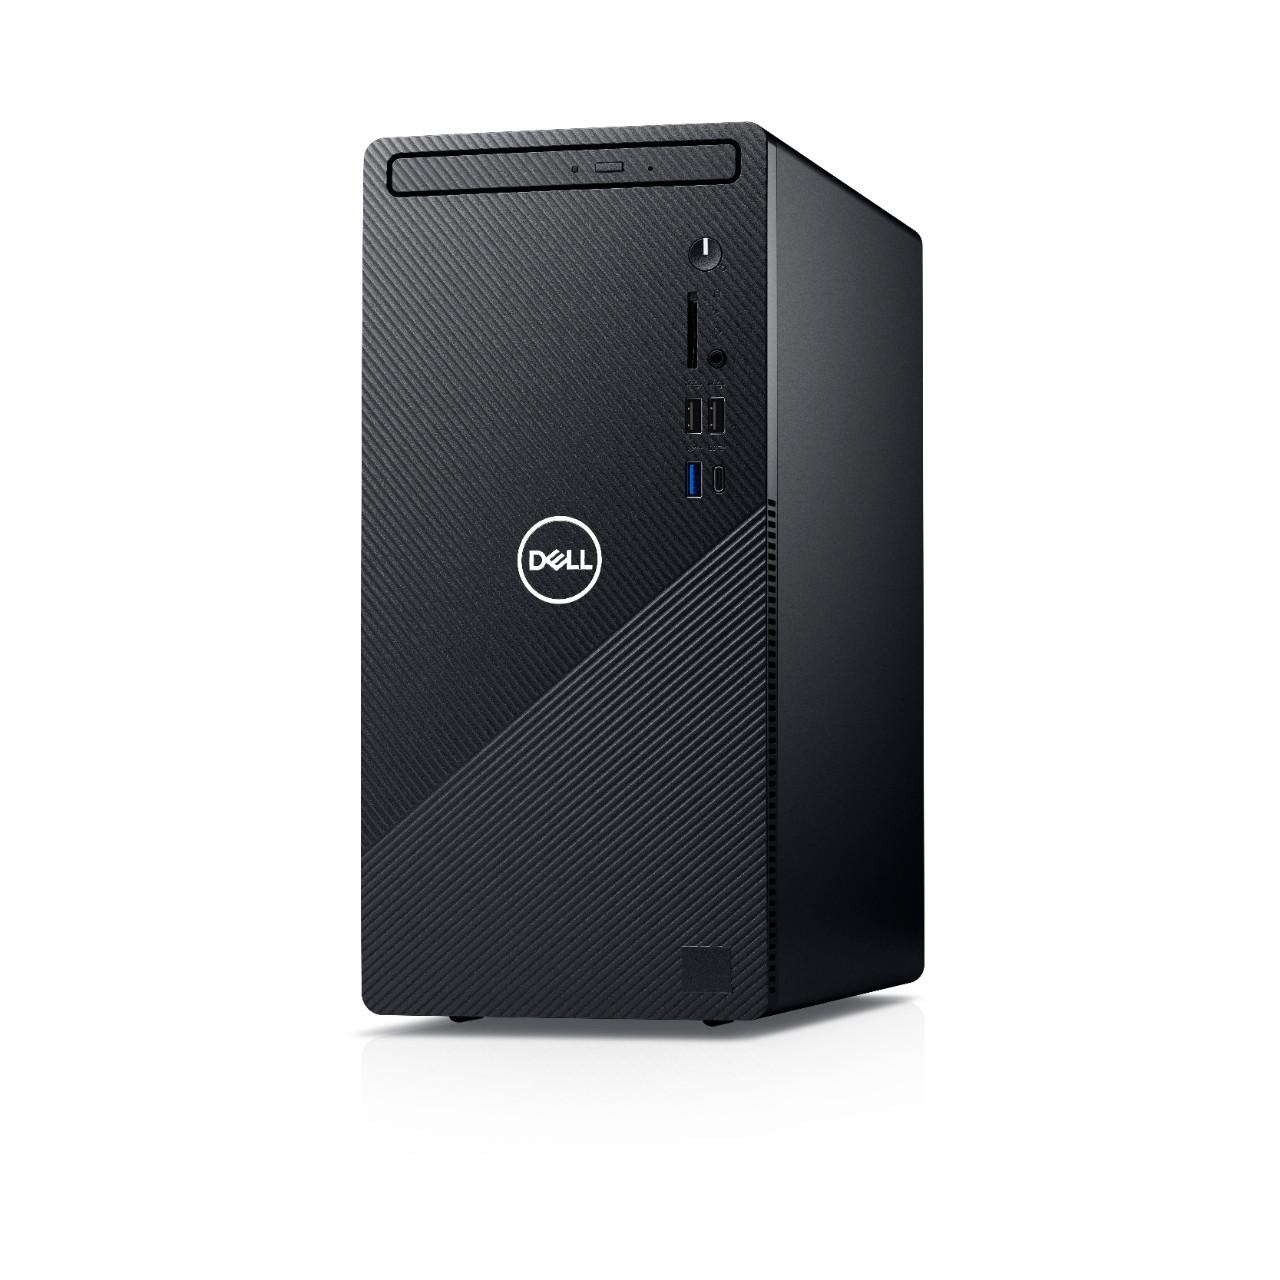 Dell Inspiron DT 3881 i7-10700/8GB/512GB/GTX1650-4GB/DVD/W10Home/2RNBD/Černý